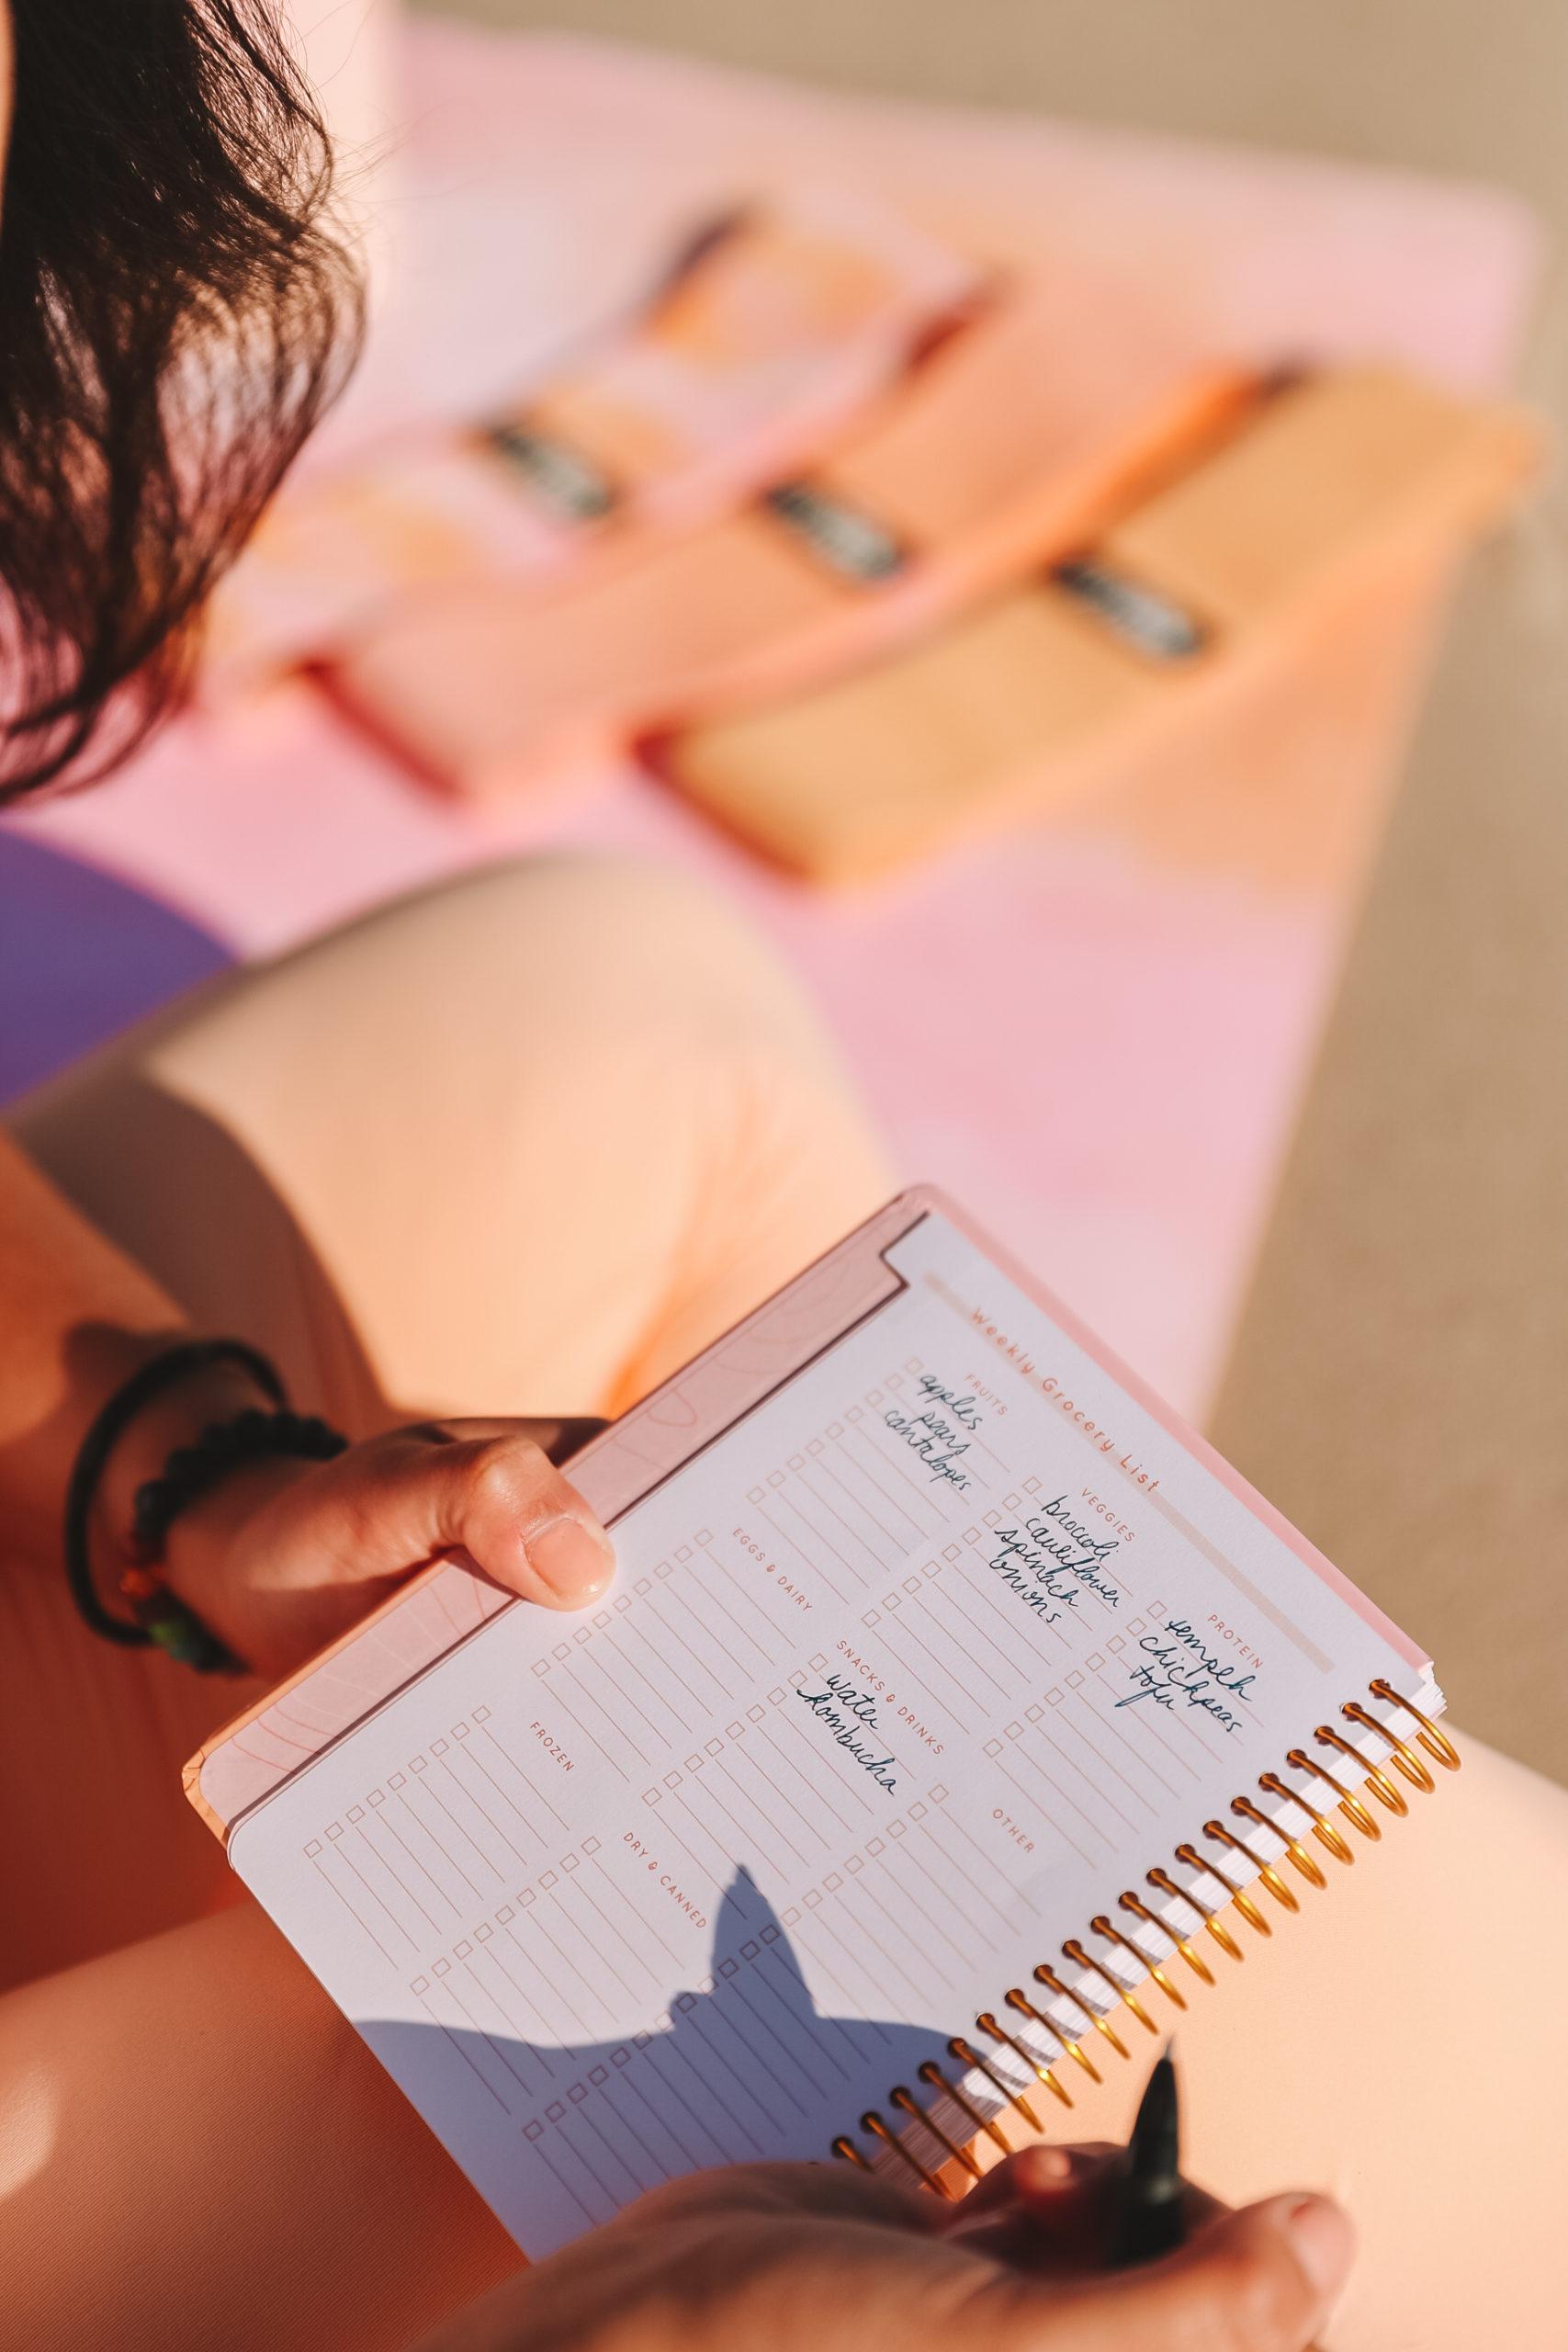 2021 90 day journey journal with writing cassey ho blogilates popflex